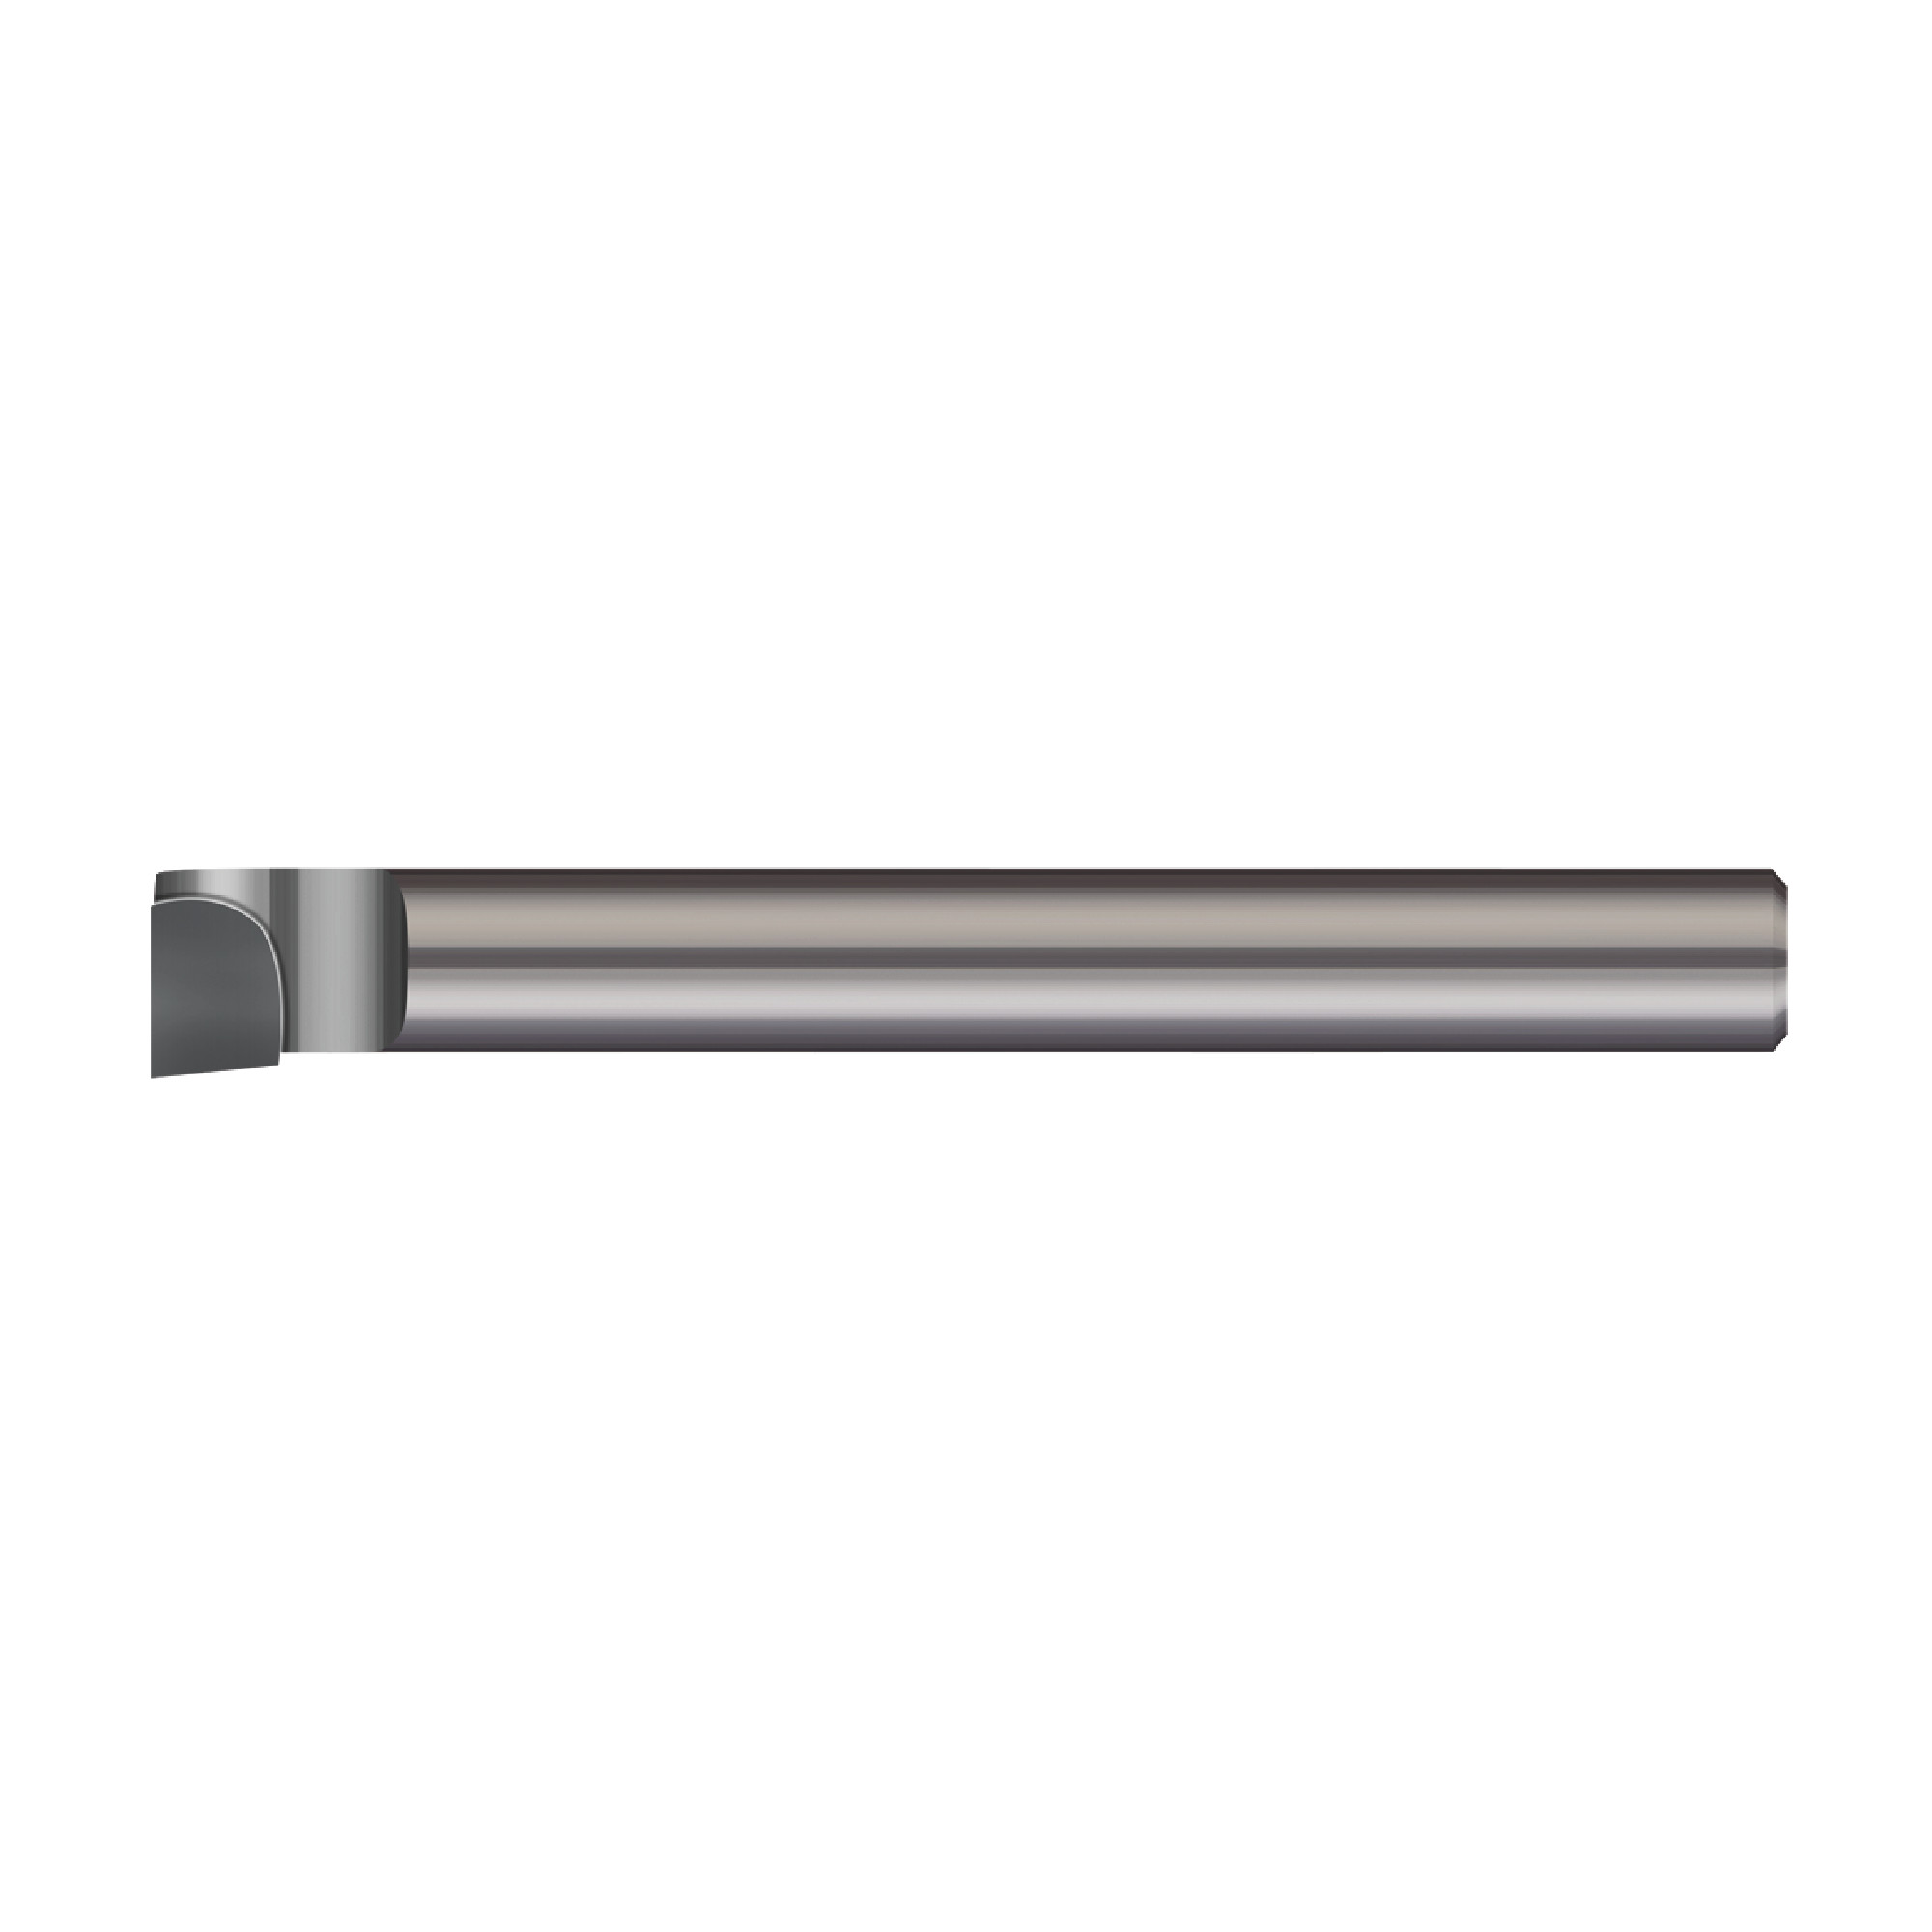 5 Piece Carbide Tipped Boring Bar Set